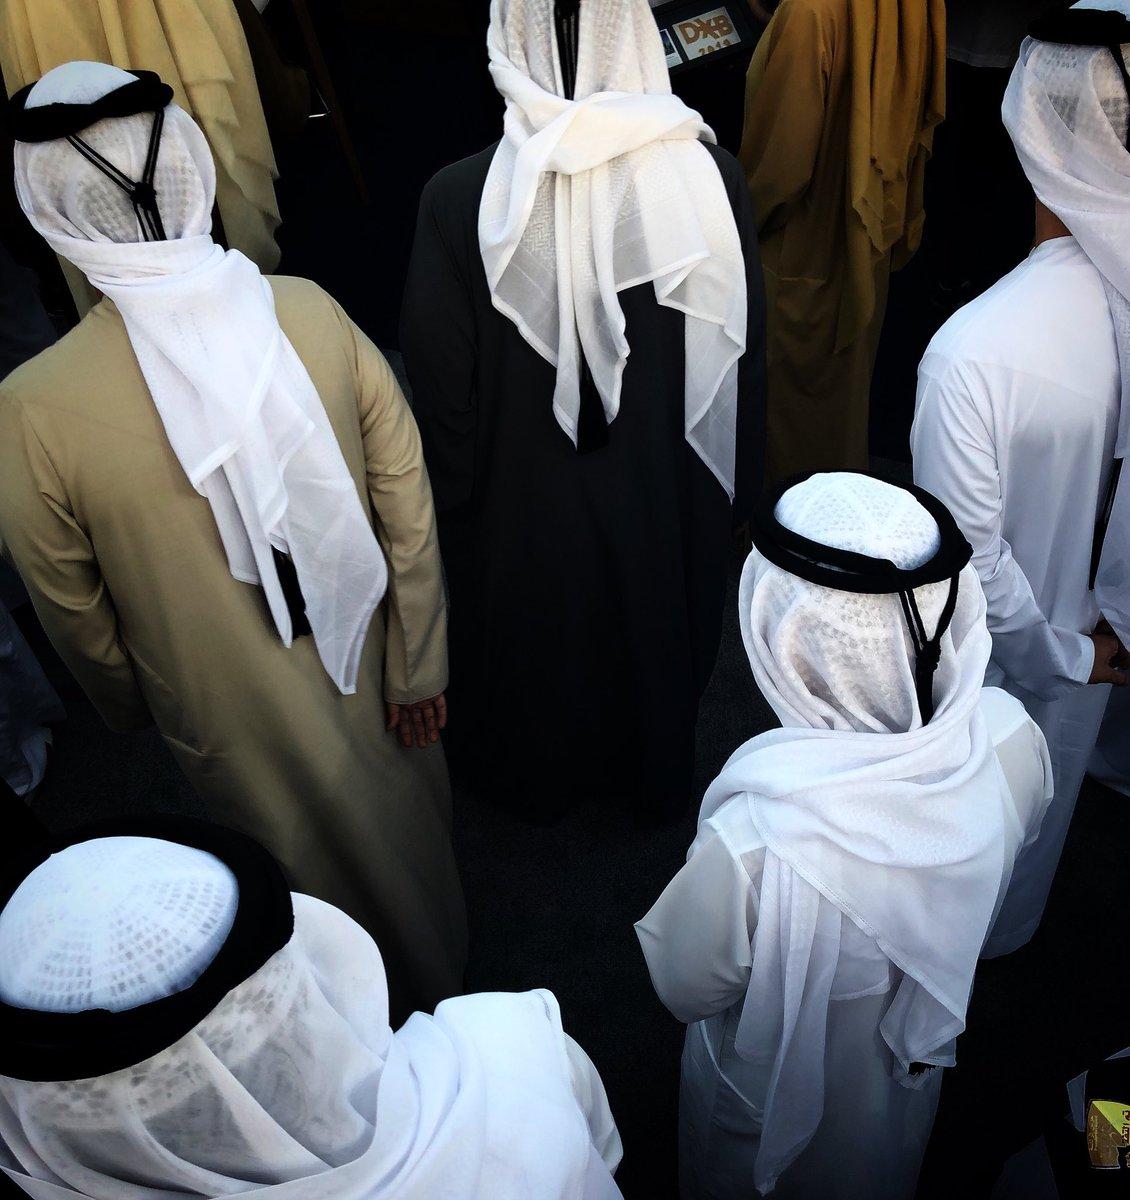 #Dubai/Gotham - #UAE